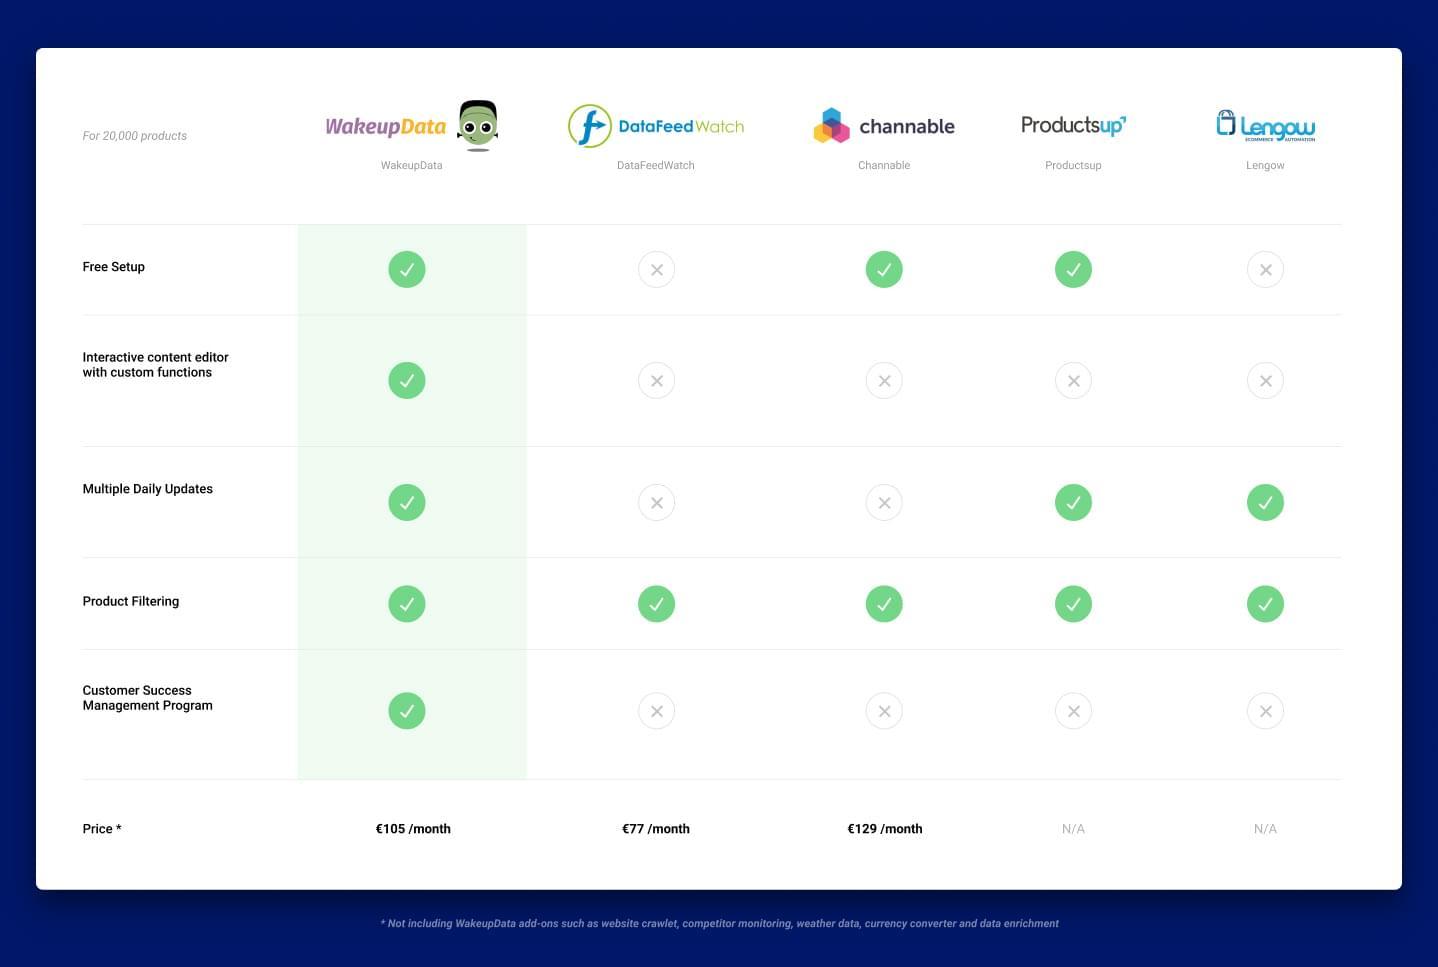 table comparing five different e-Commerce platforms